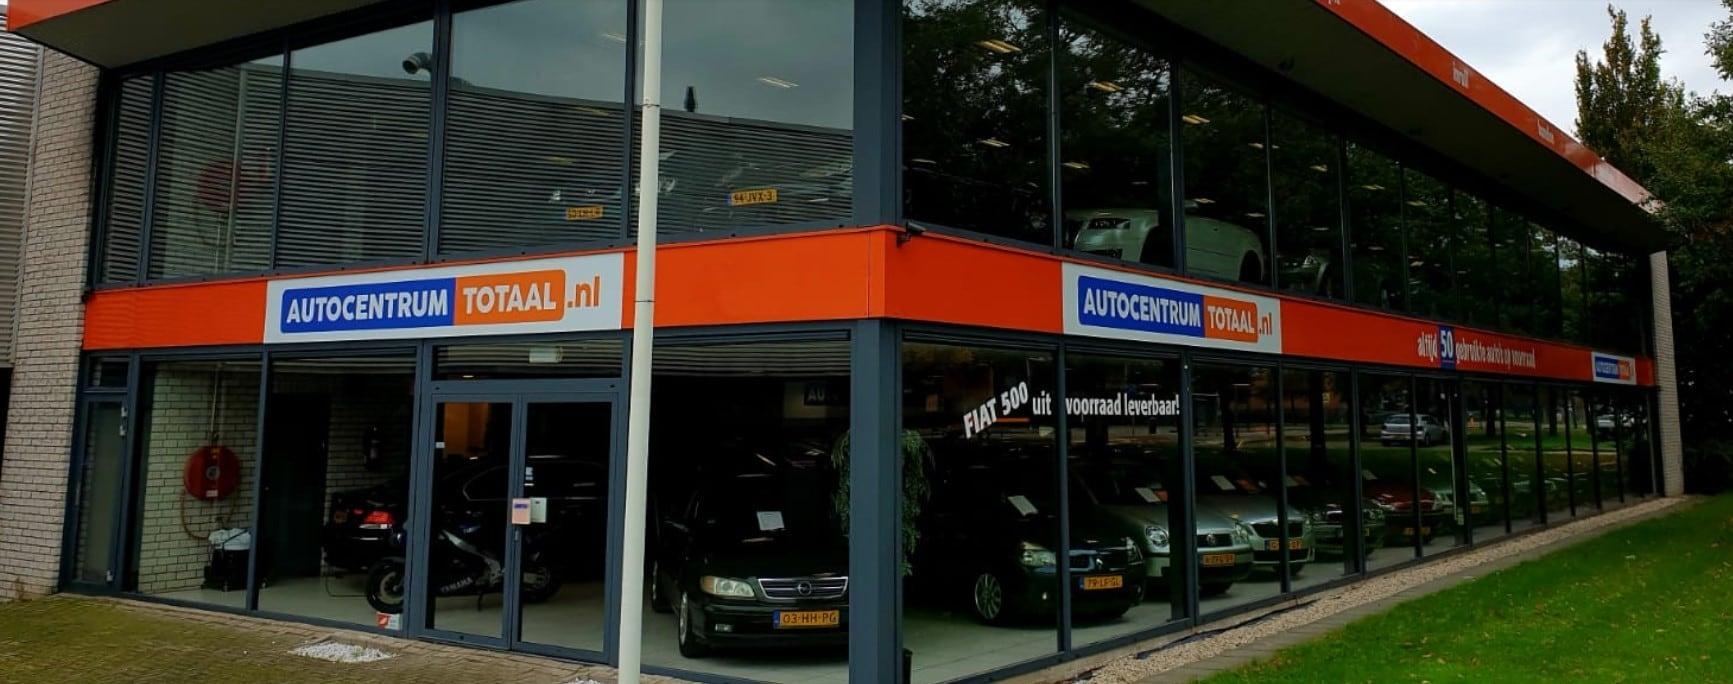 Autocentrum Totaal